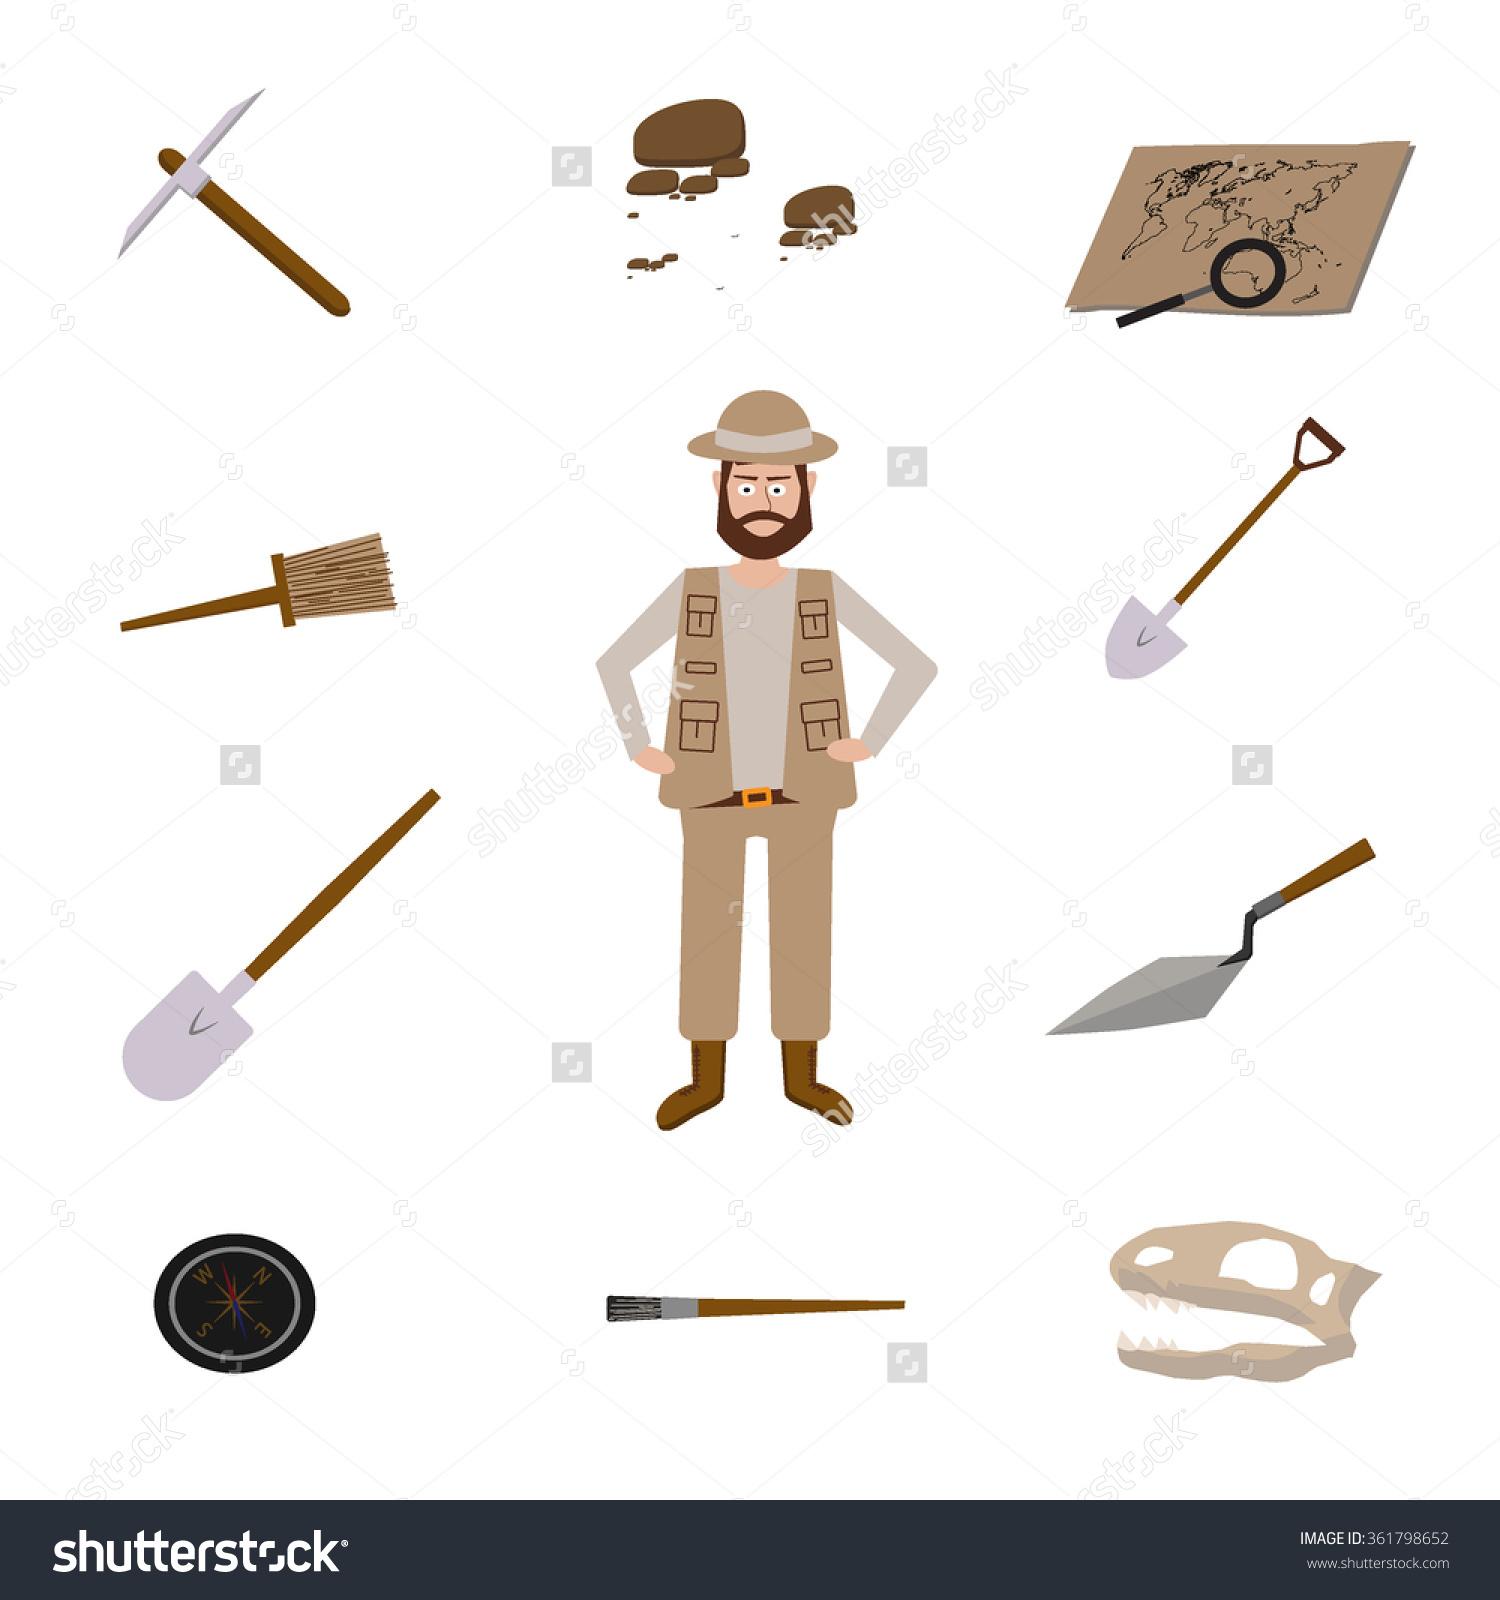 Paleontologist tools clipart.